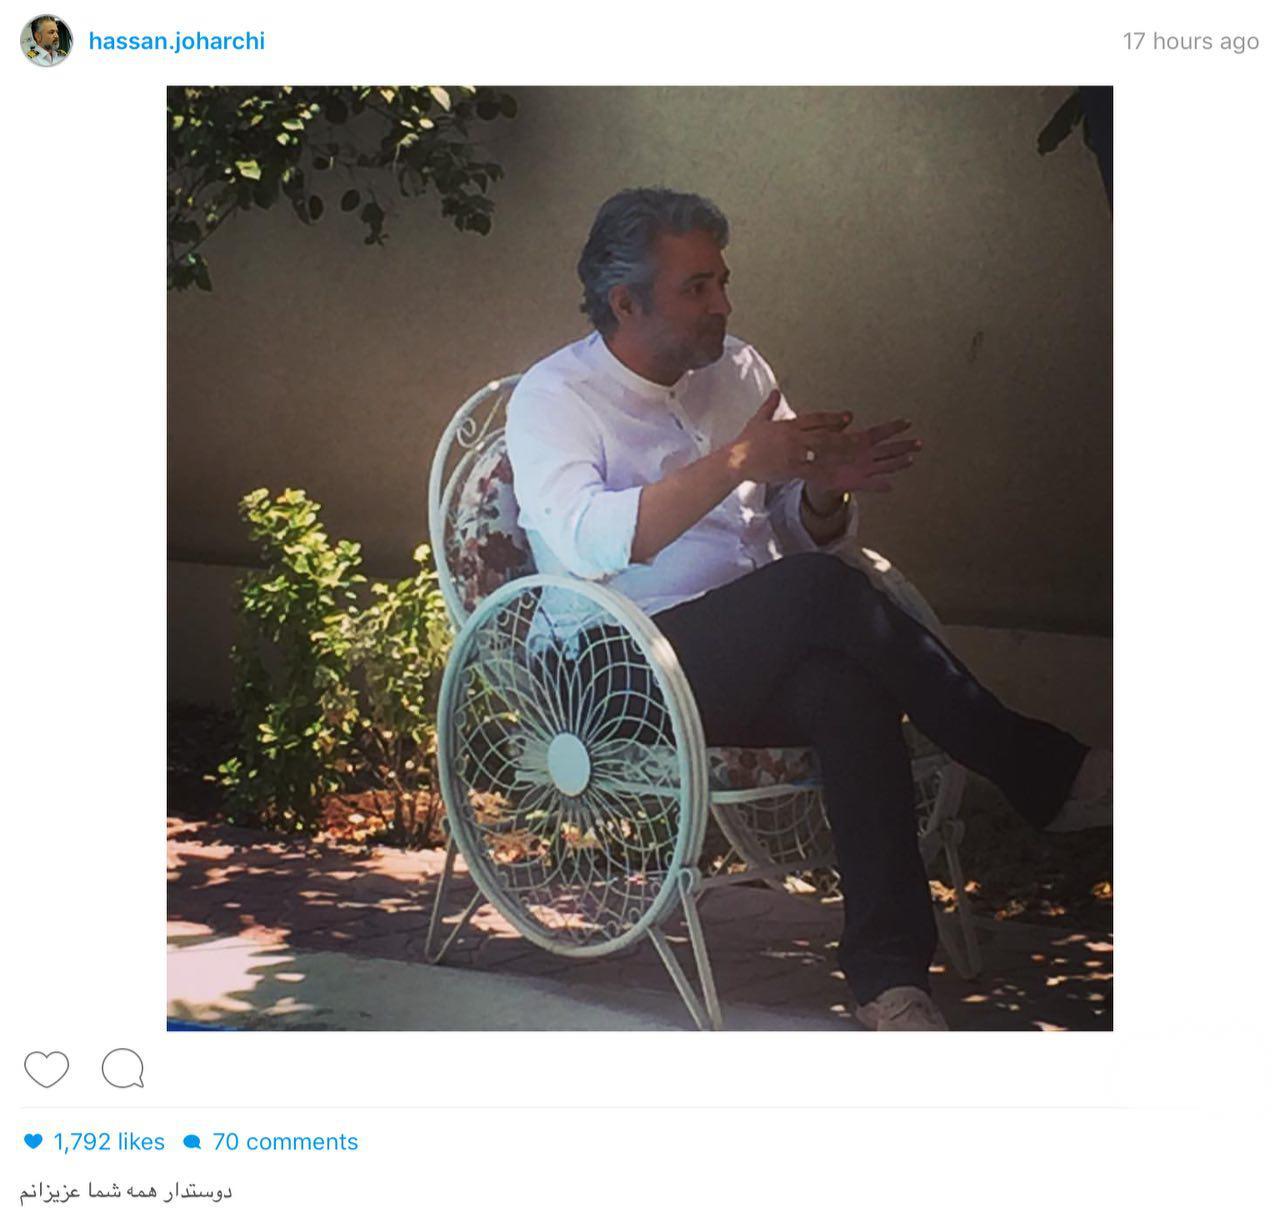 آخرین پست اینستاگرامی حسن جوهرچی